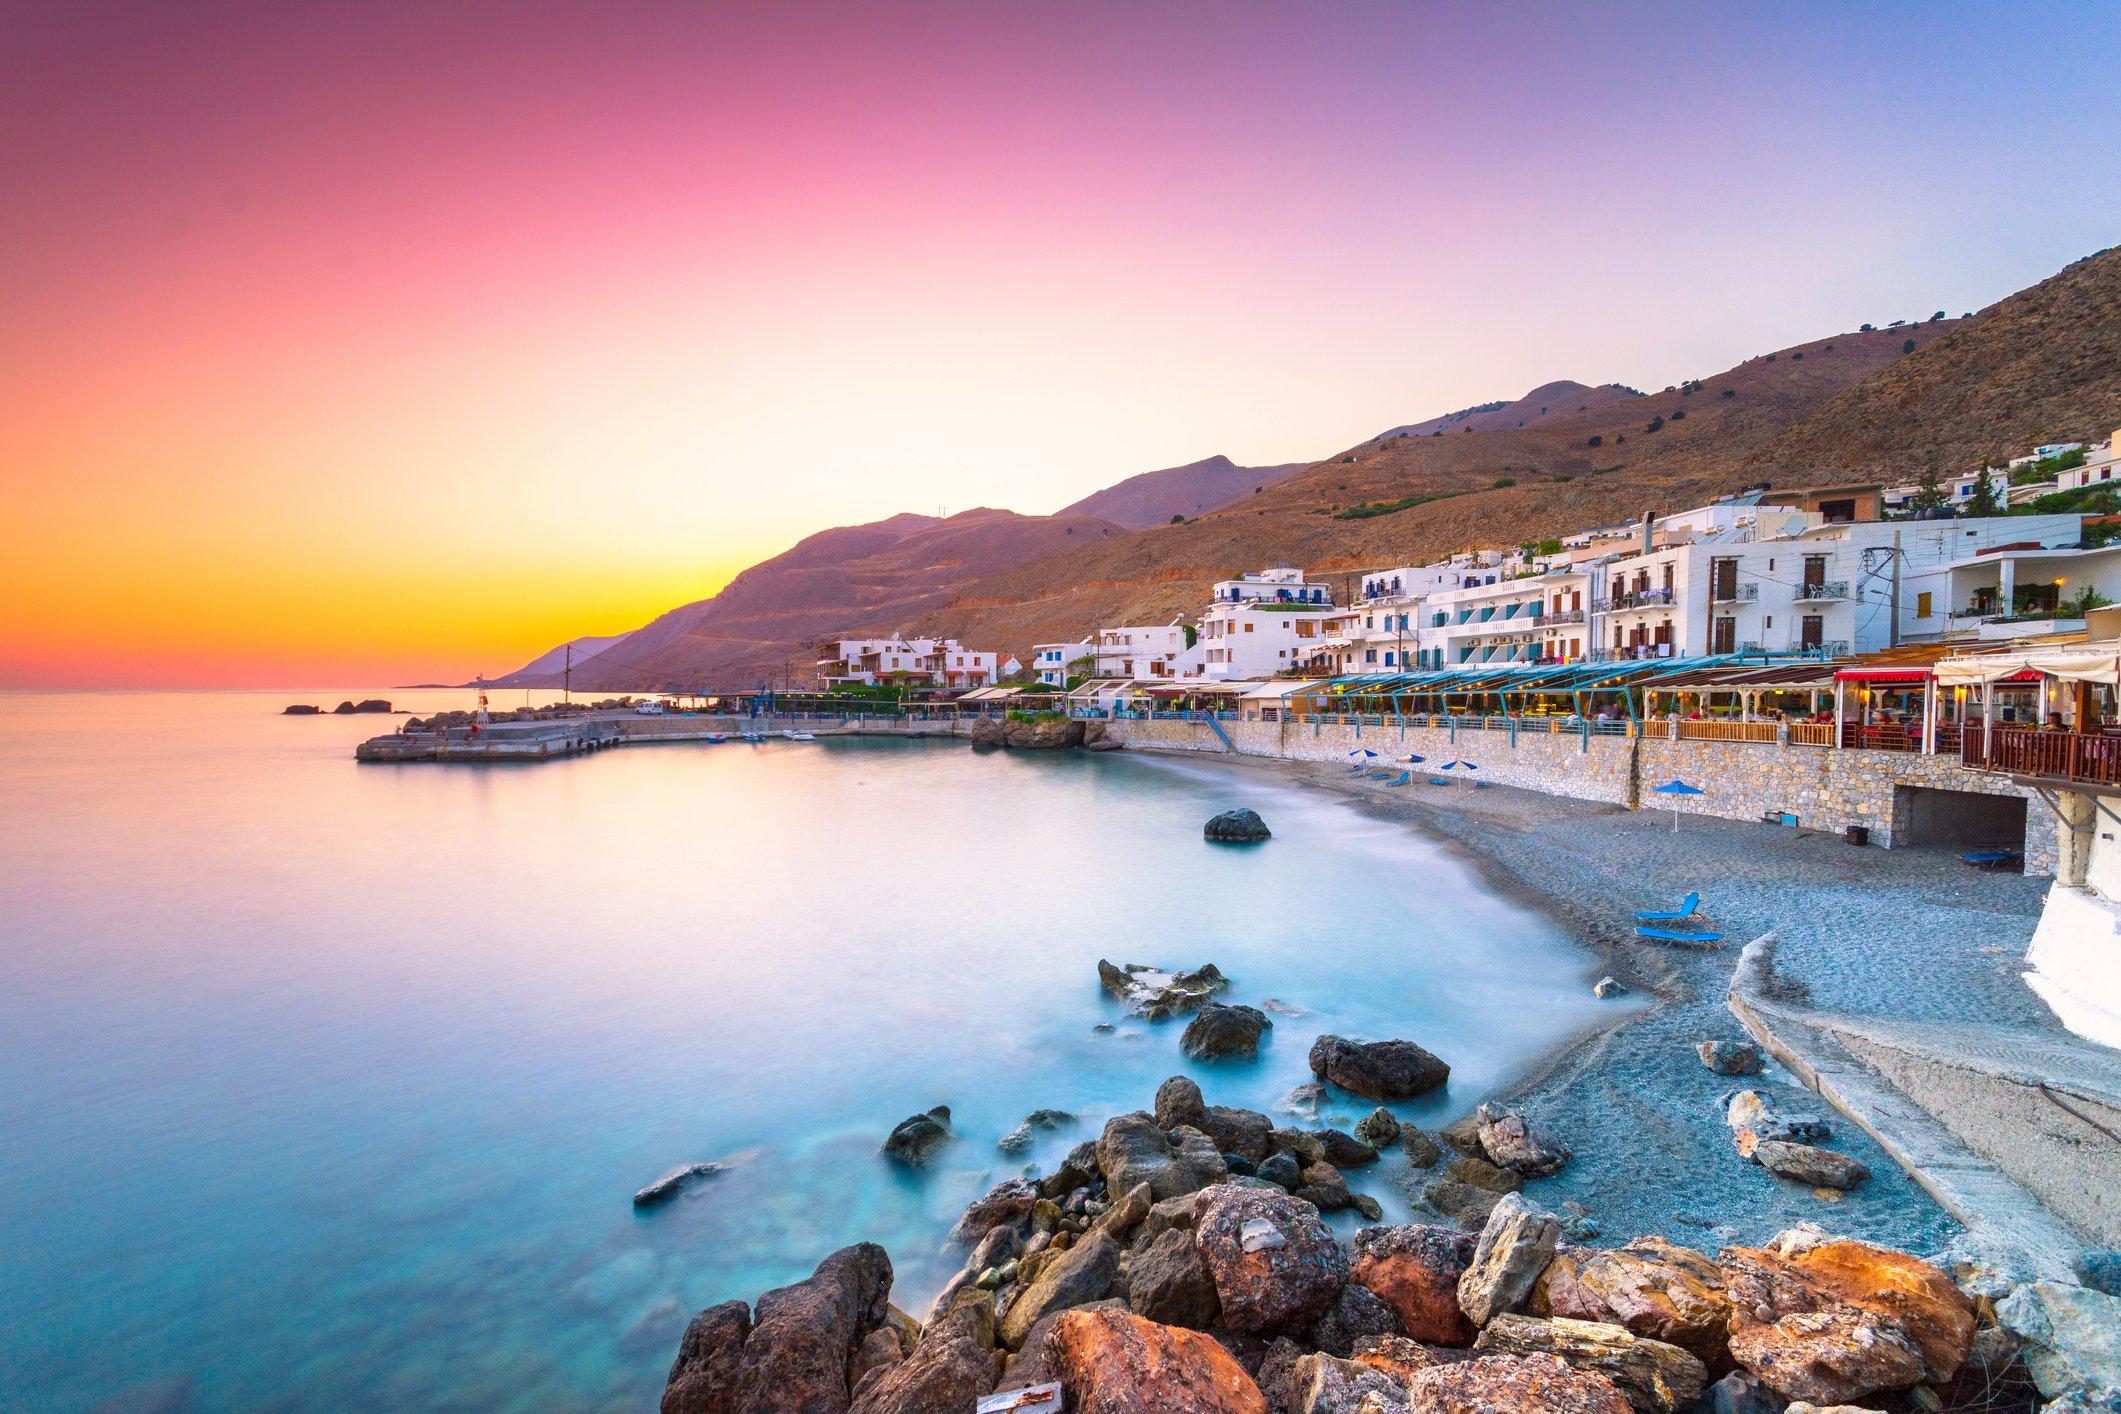 Crete's diversification efforts gain traction   Hotel Management